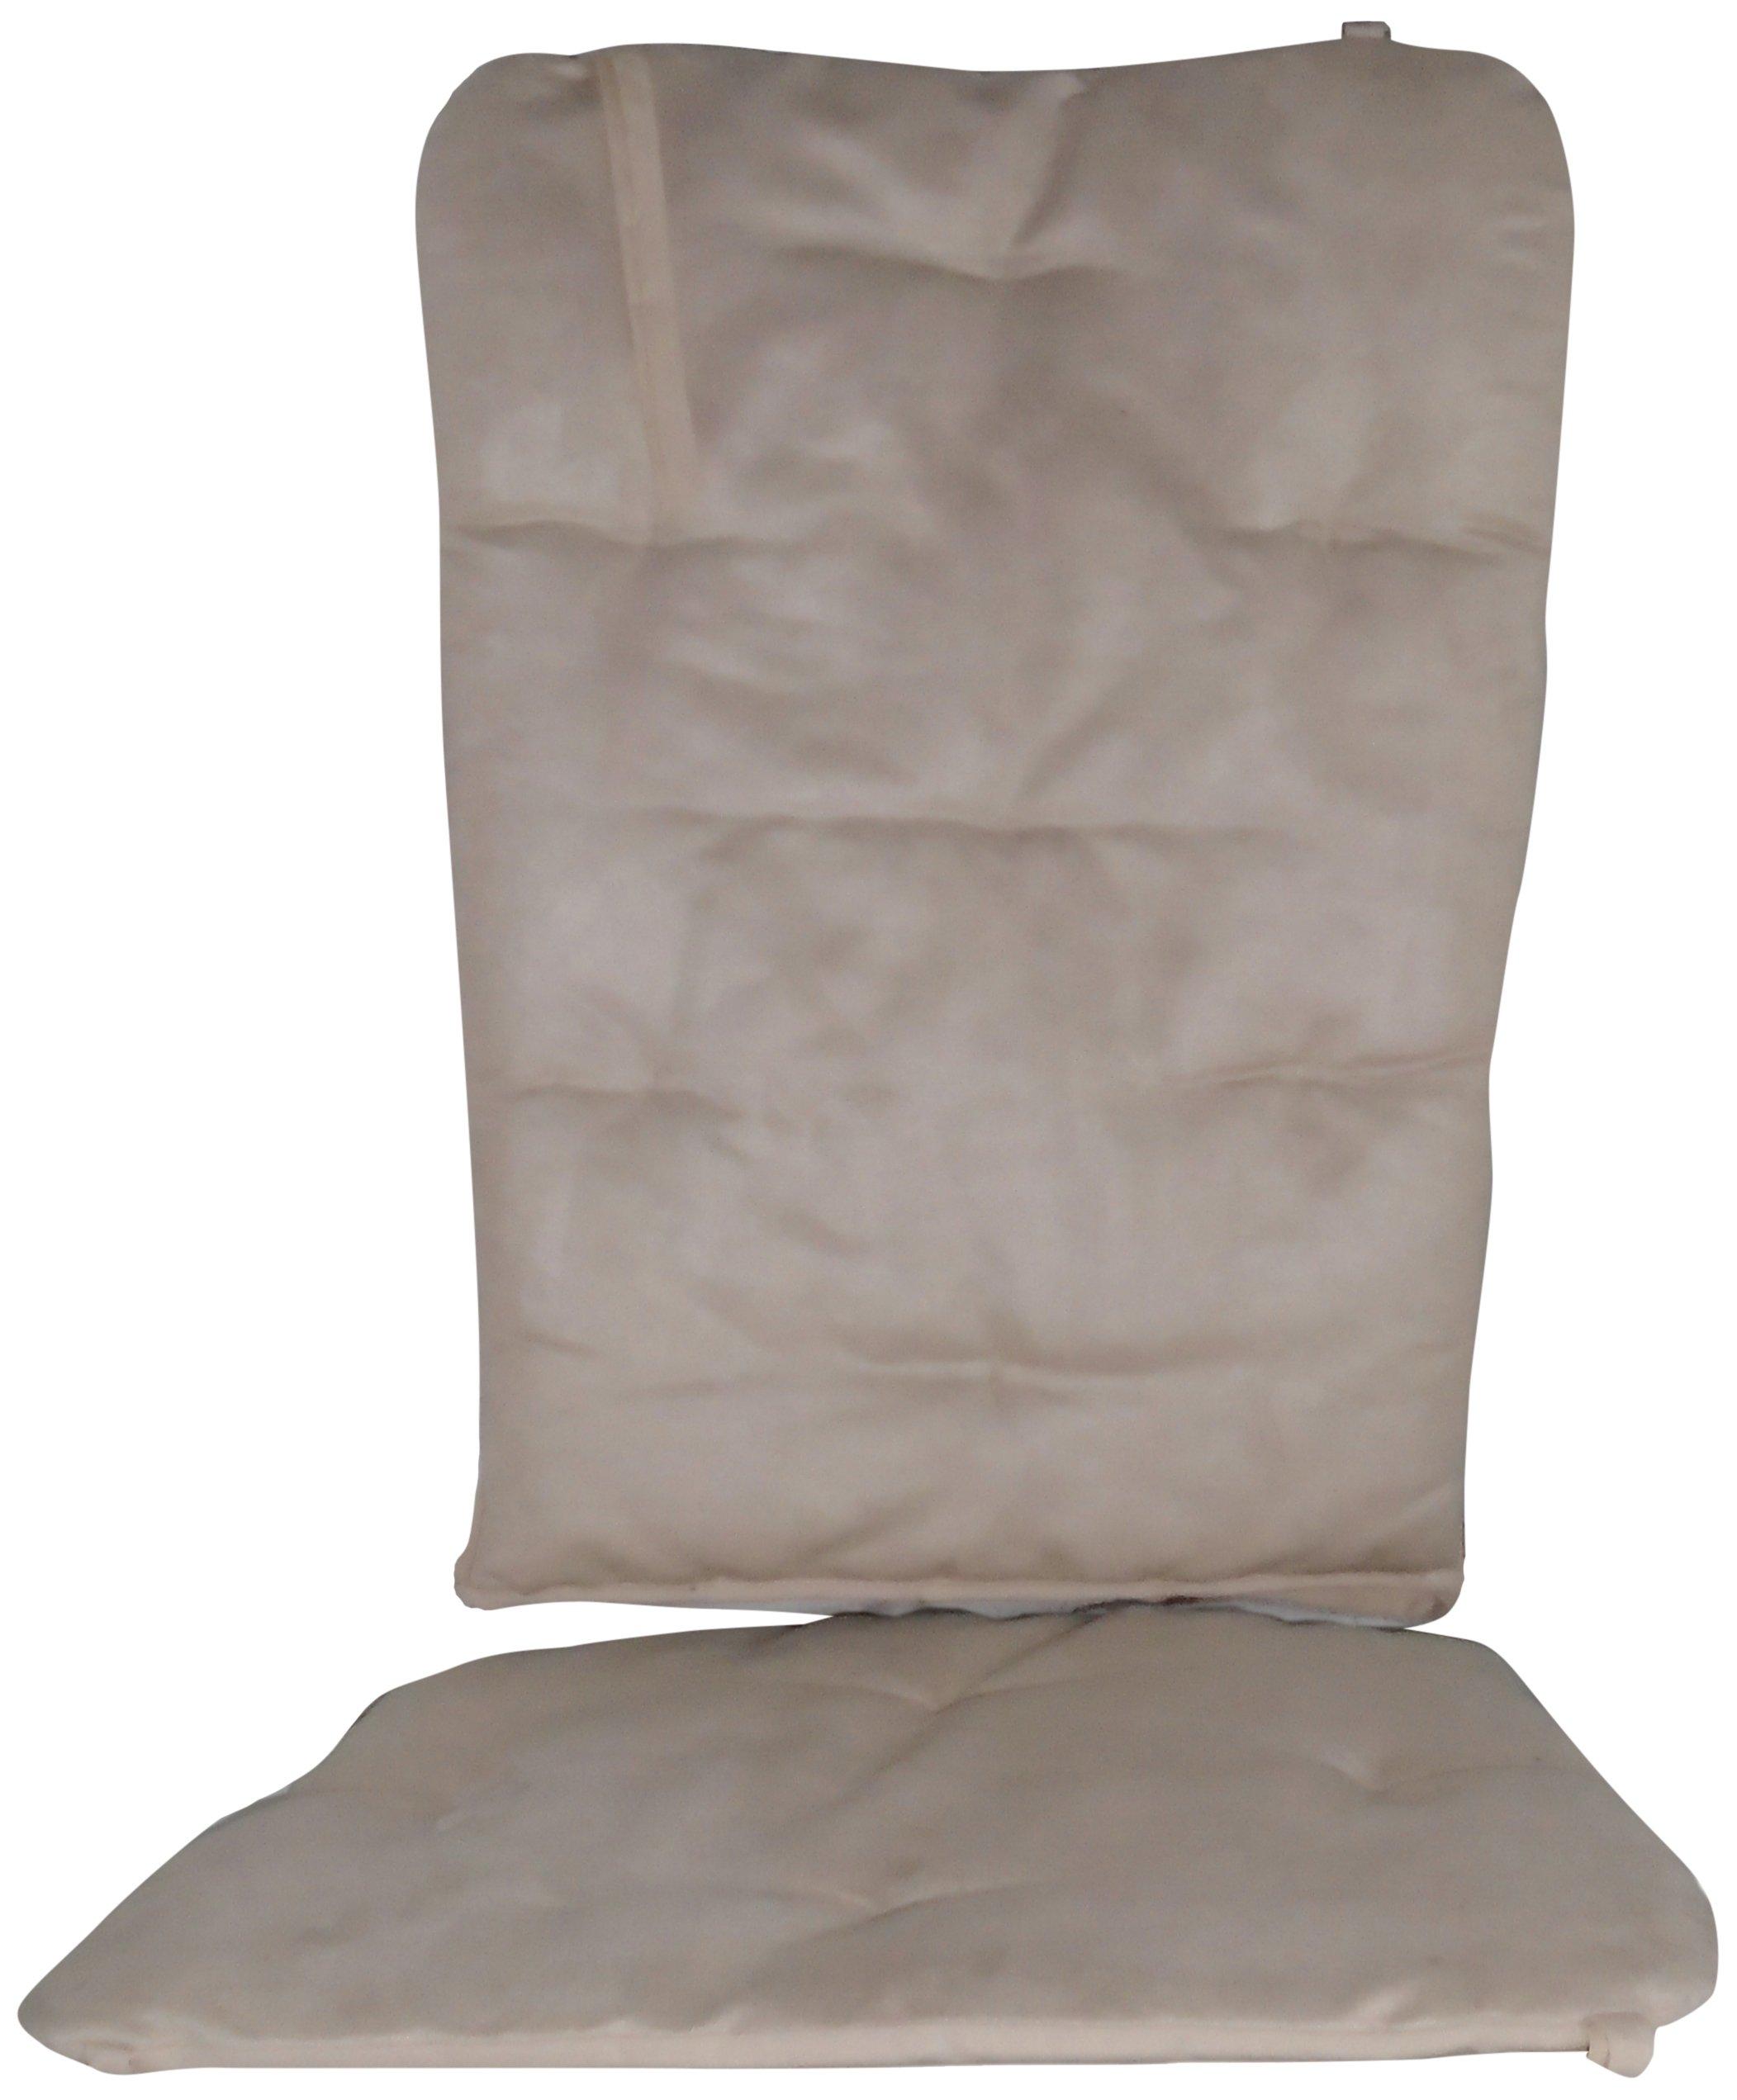 Baby Doll Bedding Suede Rocking Chair Cushion, Beige